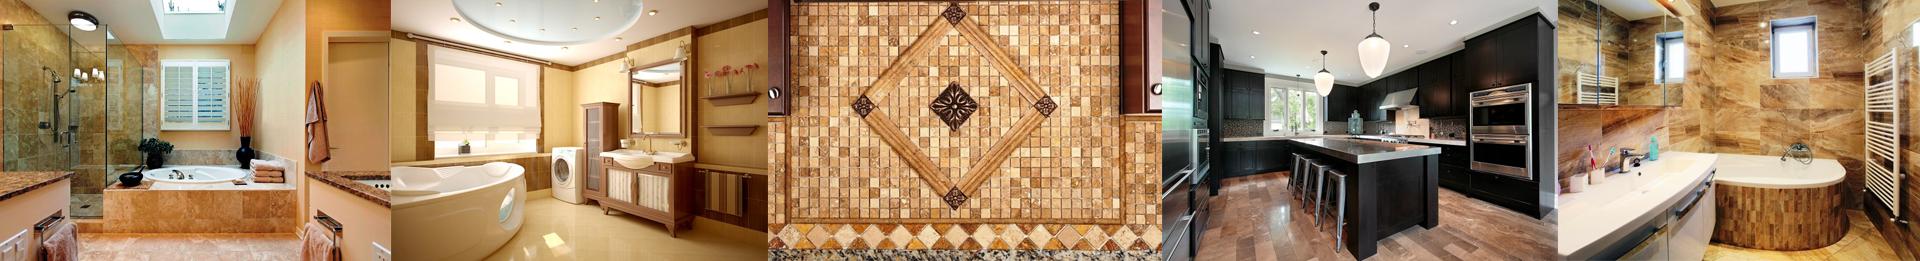 Tile Affordable Flooring Connection